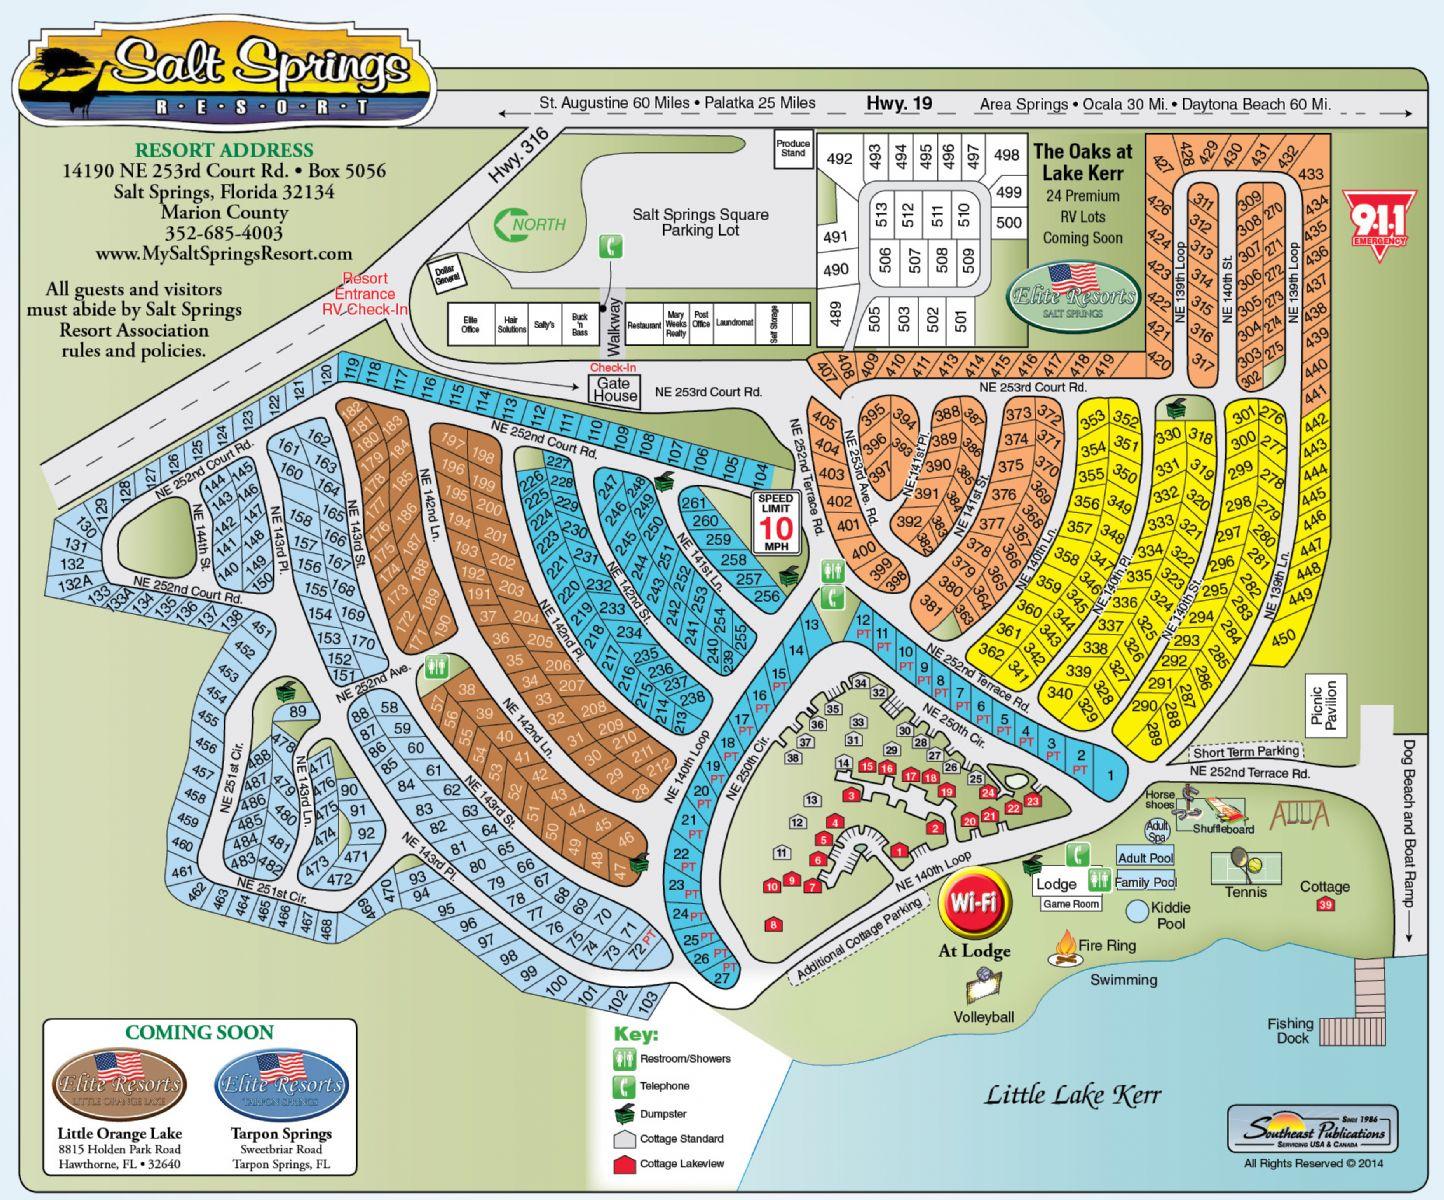 Salt Springs Campground Florida Map Of The Resort